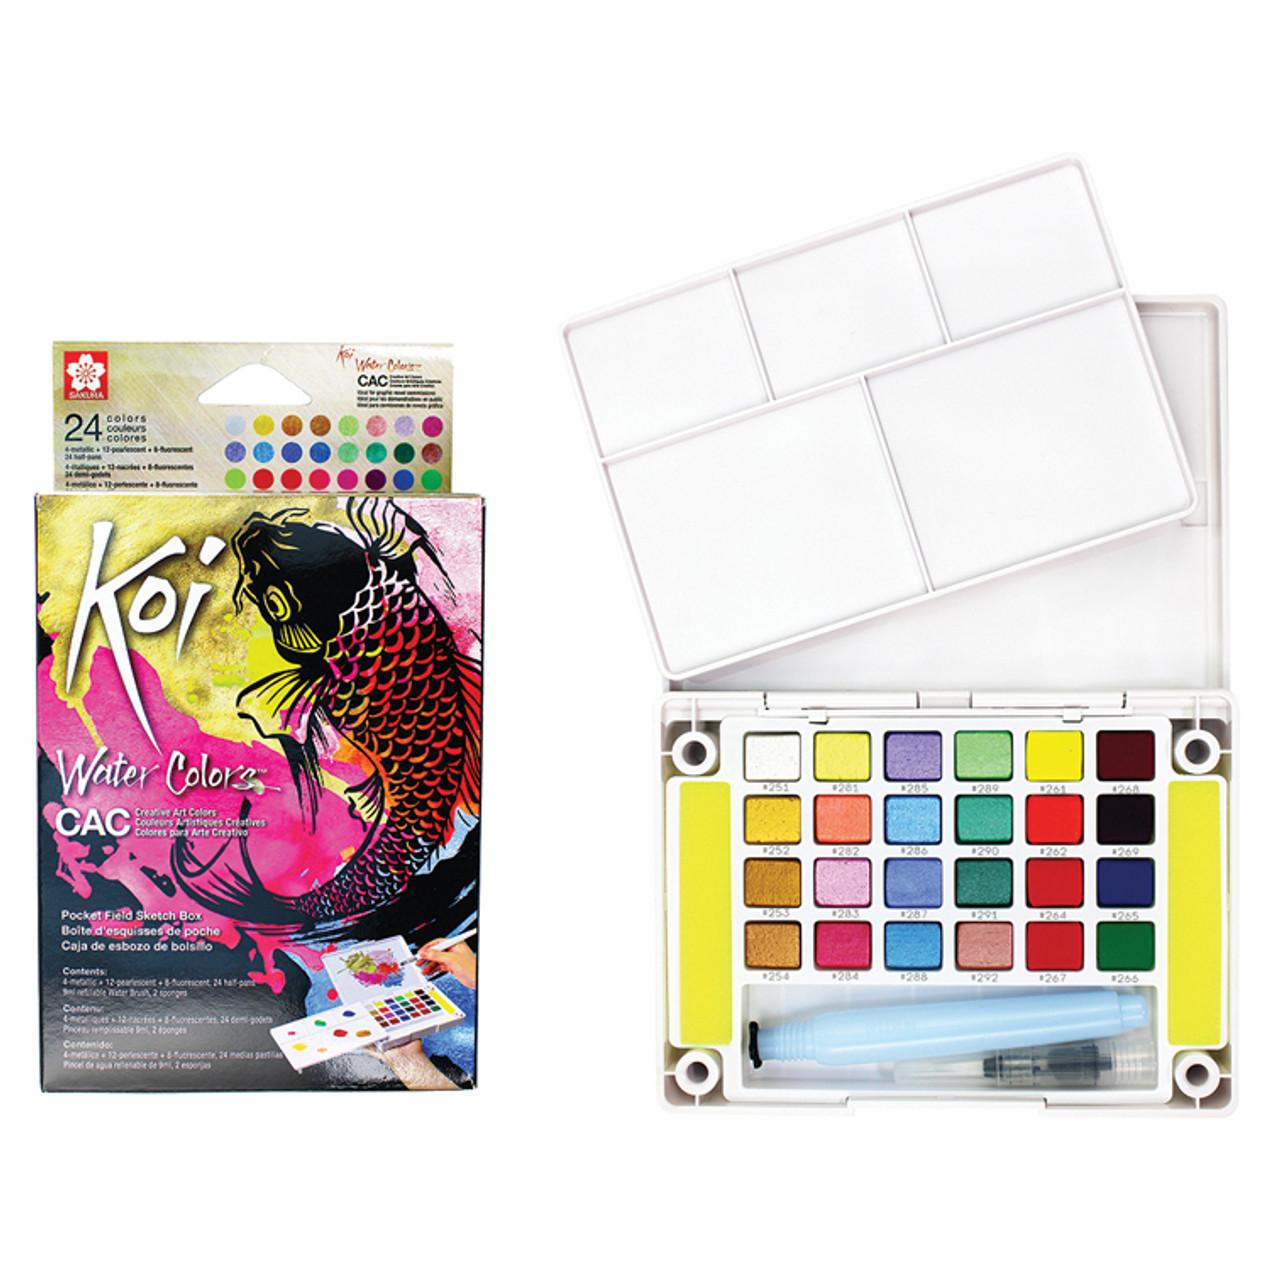 KOI Watercolor CAC 12-color Set